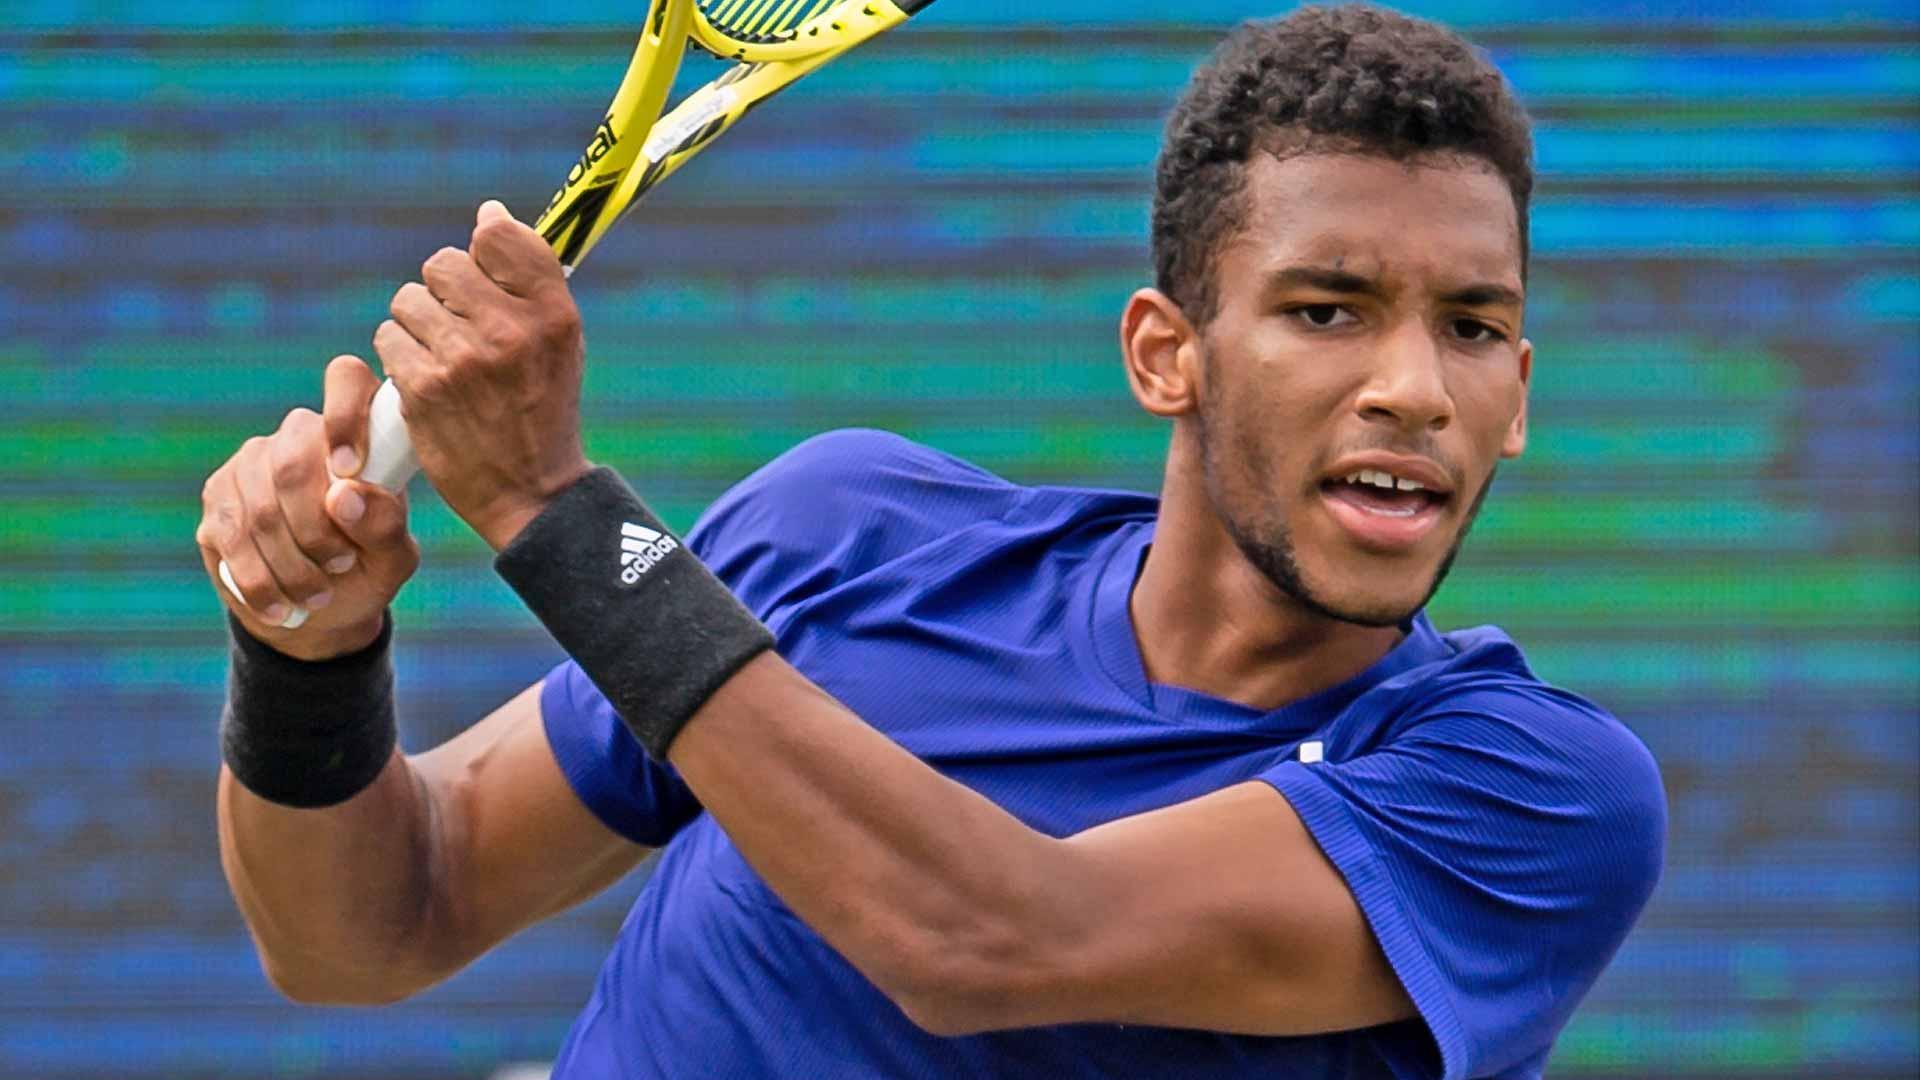 Stuttgart Open 2021: Felix Auger-Aliassime vs. Sam Querrey Tennis Pick and Prediction